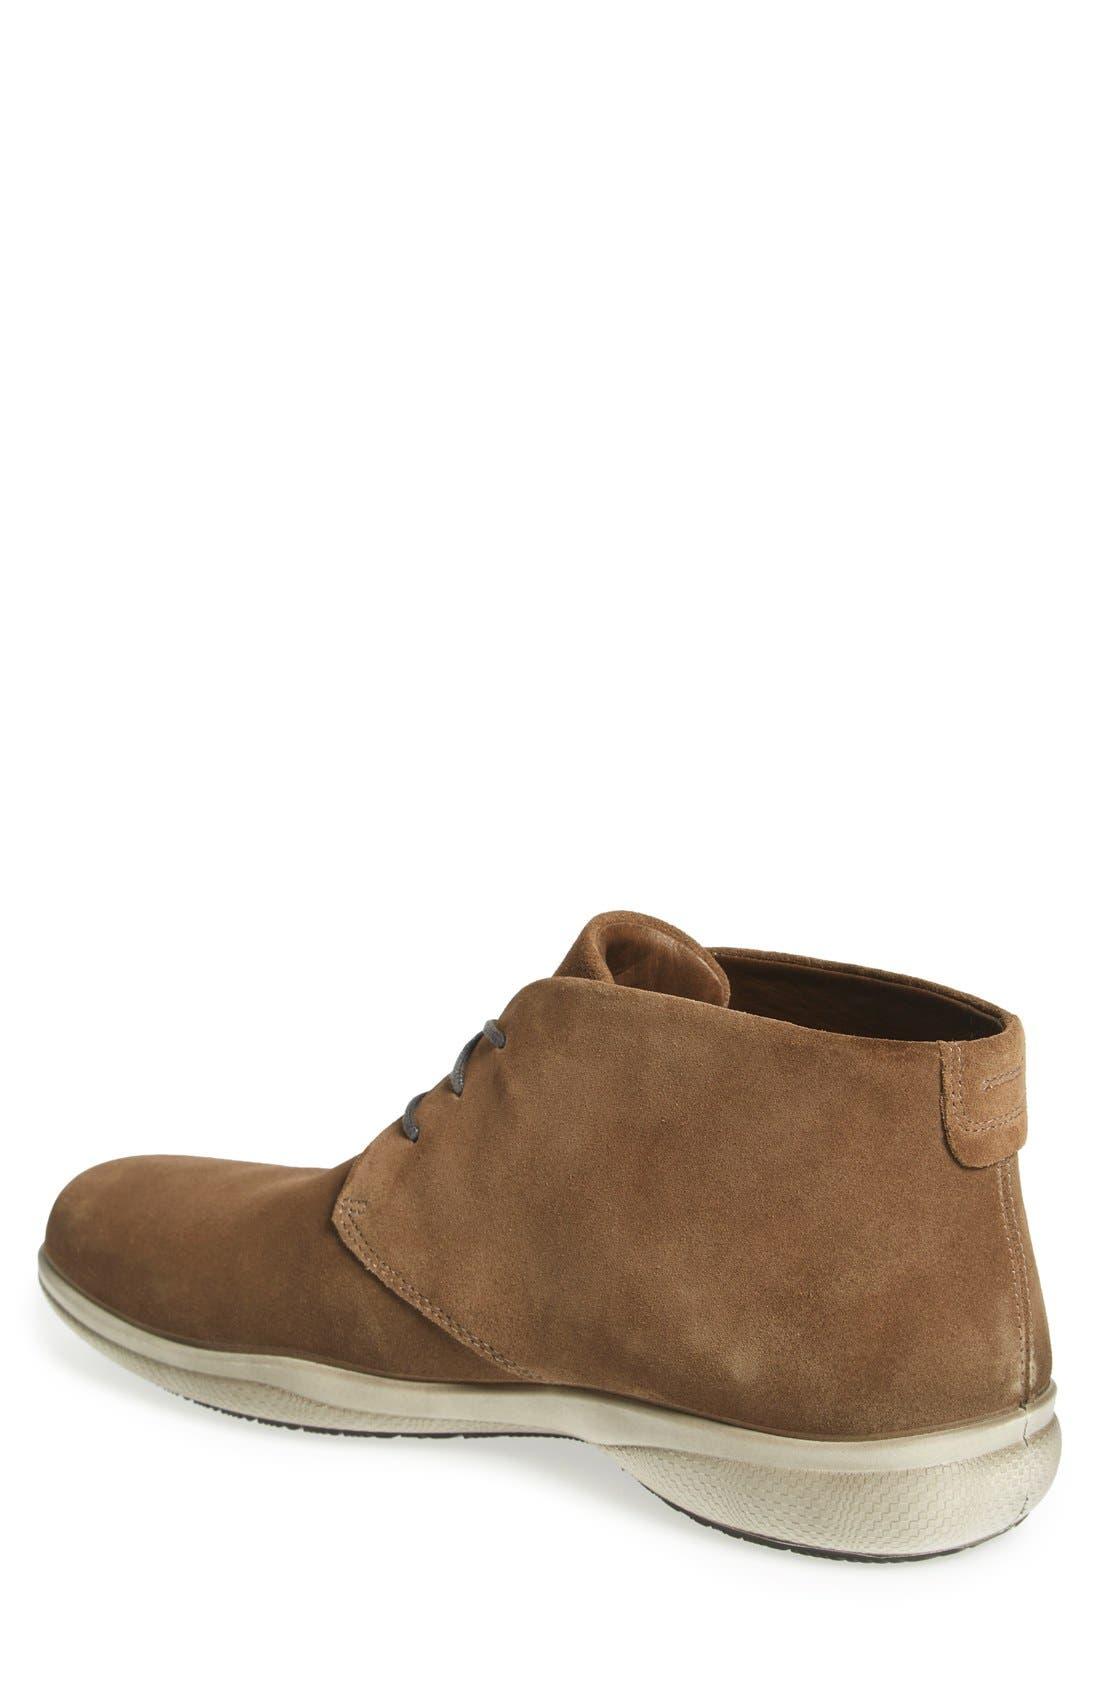 'Grenoble' Chukka Boot,                             Alternate thumbnail 2, color,                             Birch Leather